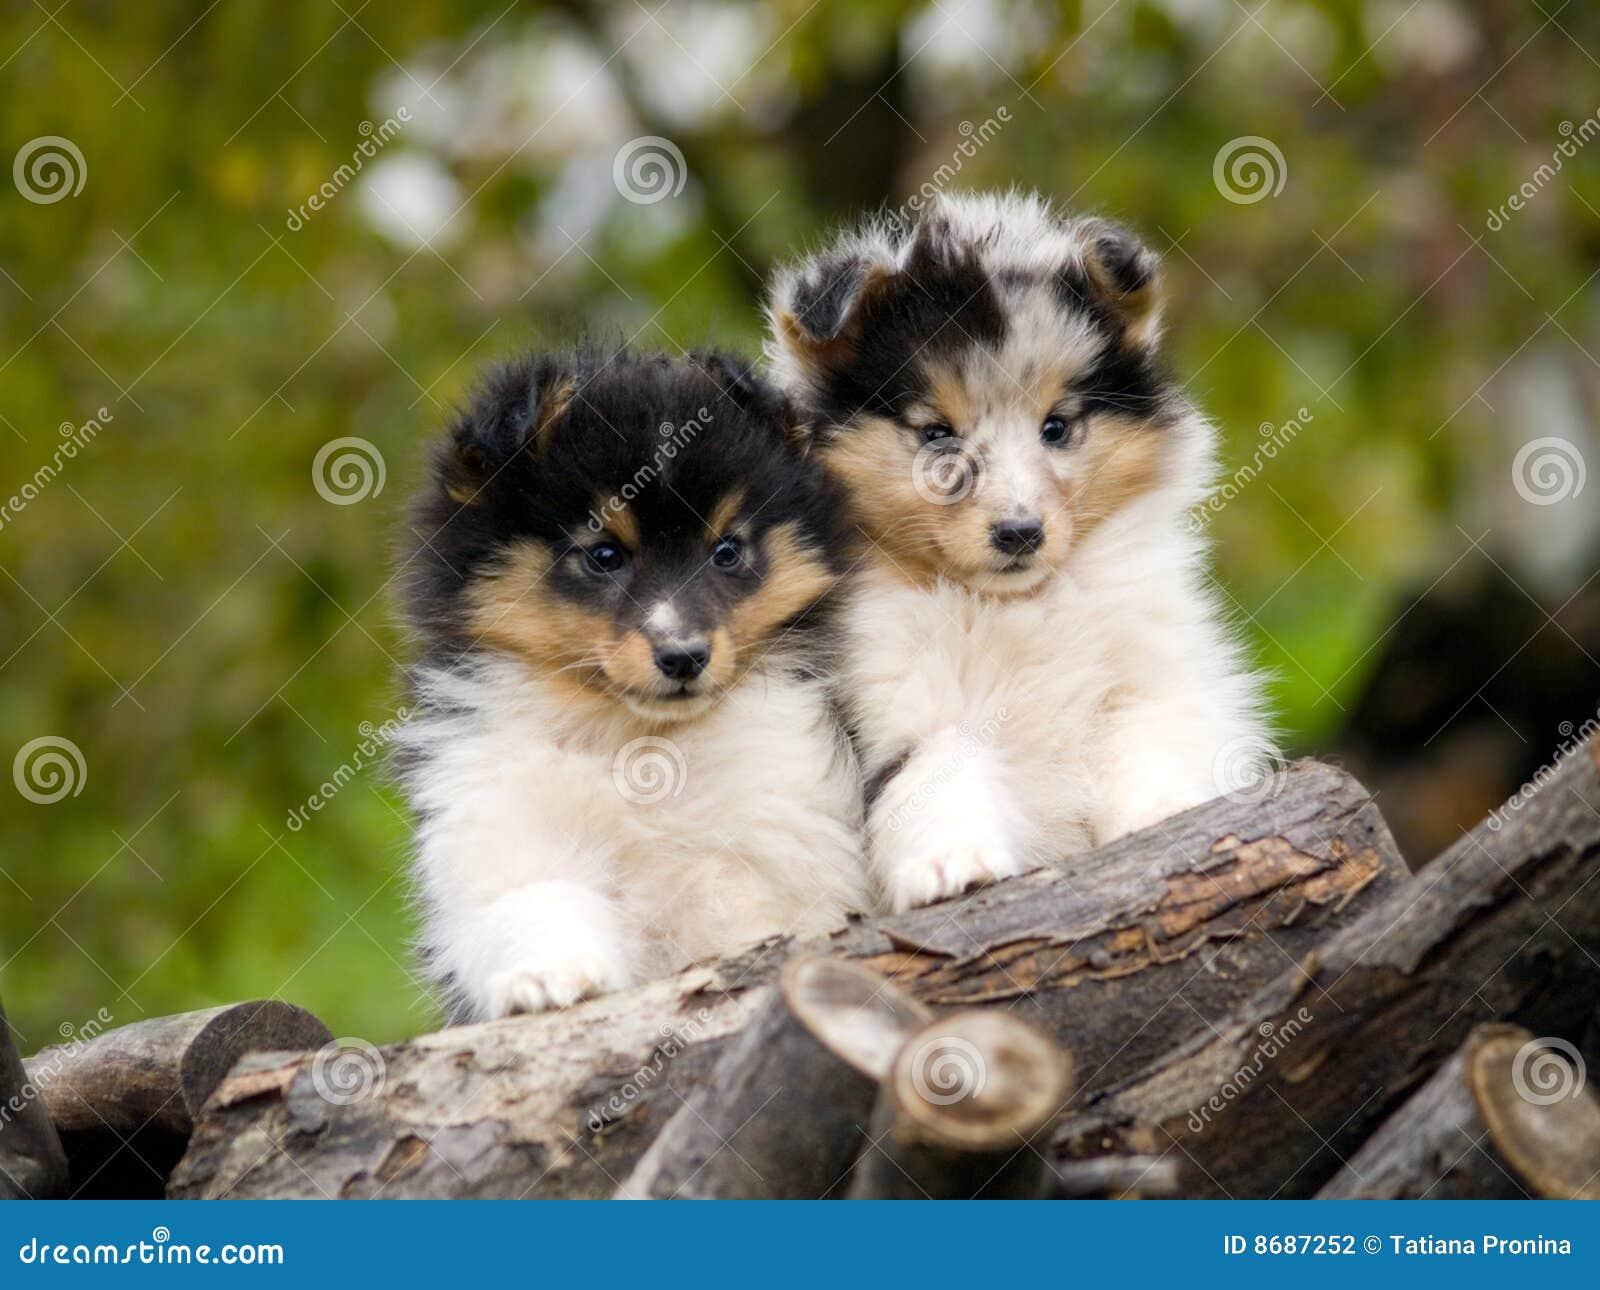 Boy Dog Names For Shetland Sheepdogs